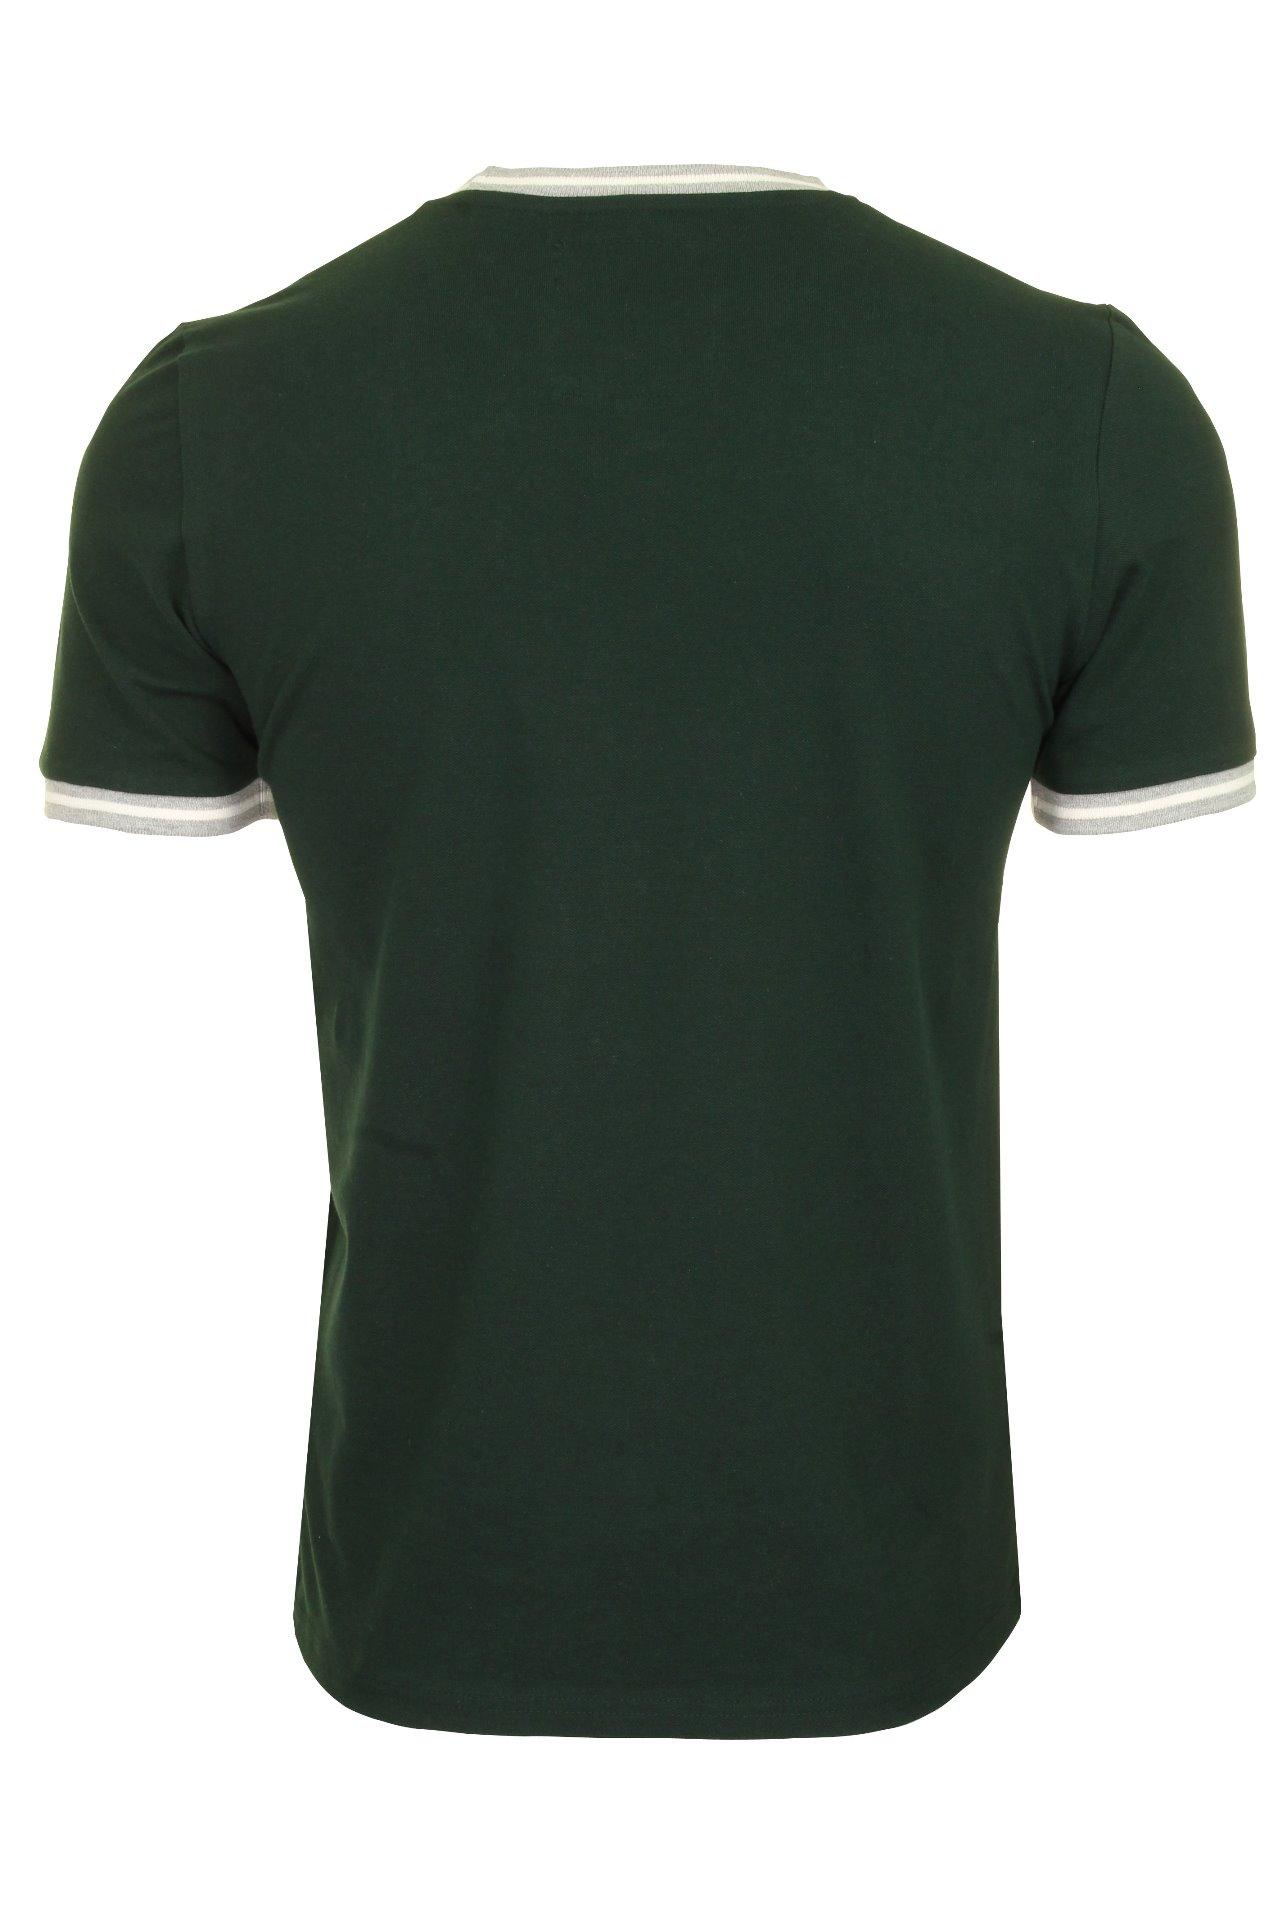 Tokyo-Laundry-Mens-Pique-Crew-Neck-T-Shirt-039-Wentworth-039 thumbnail 11